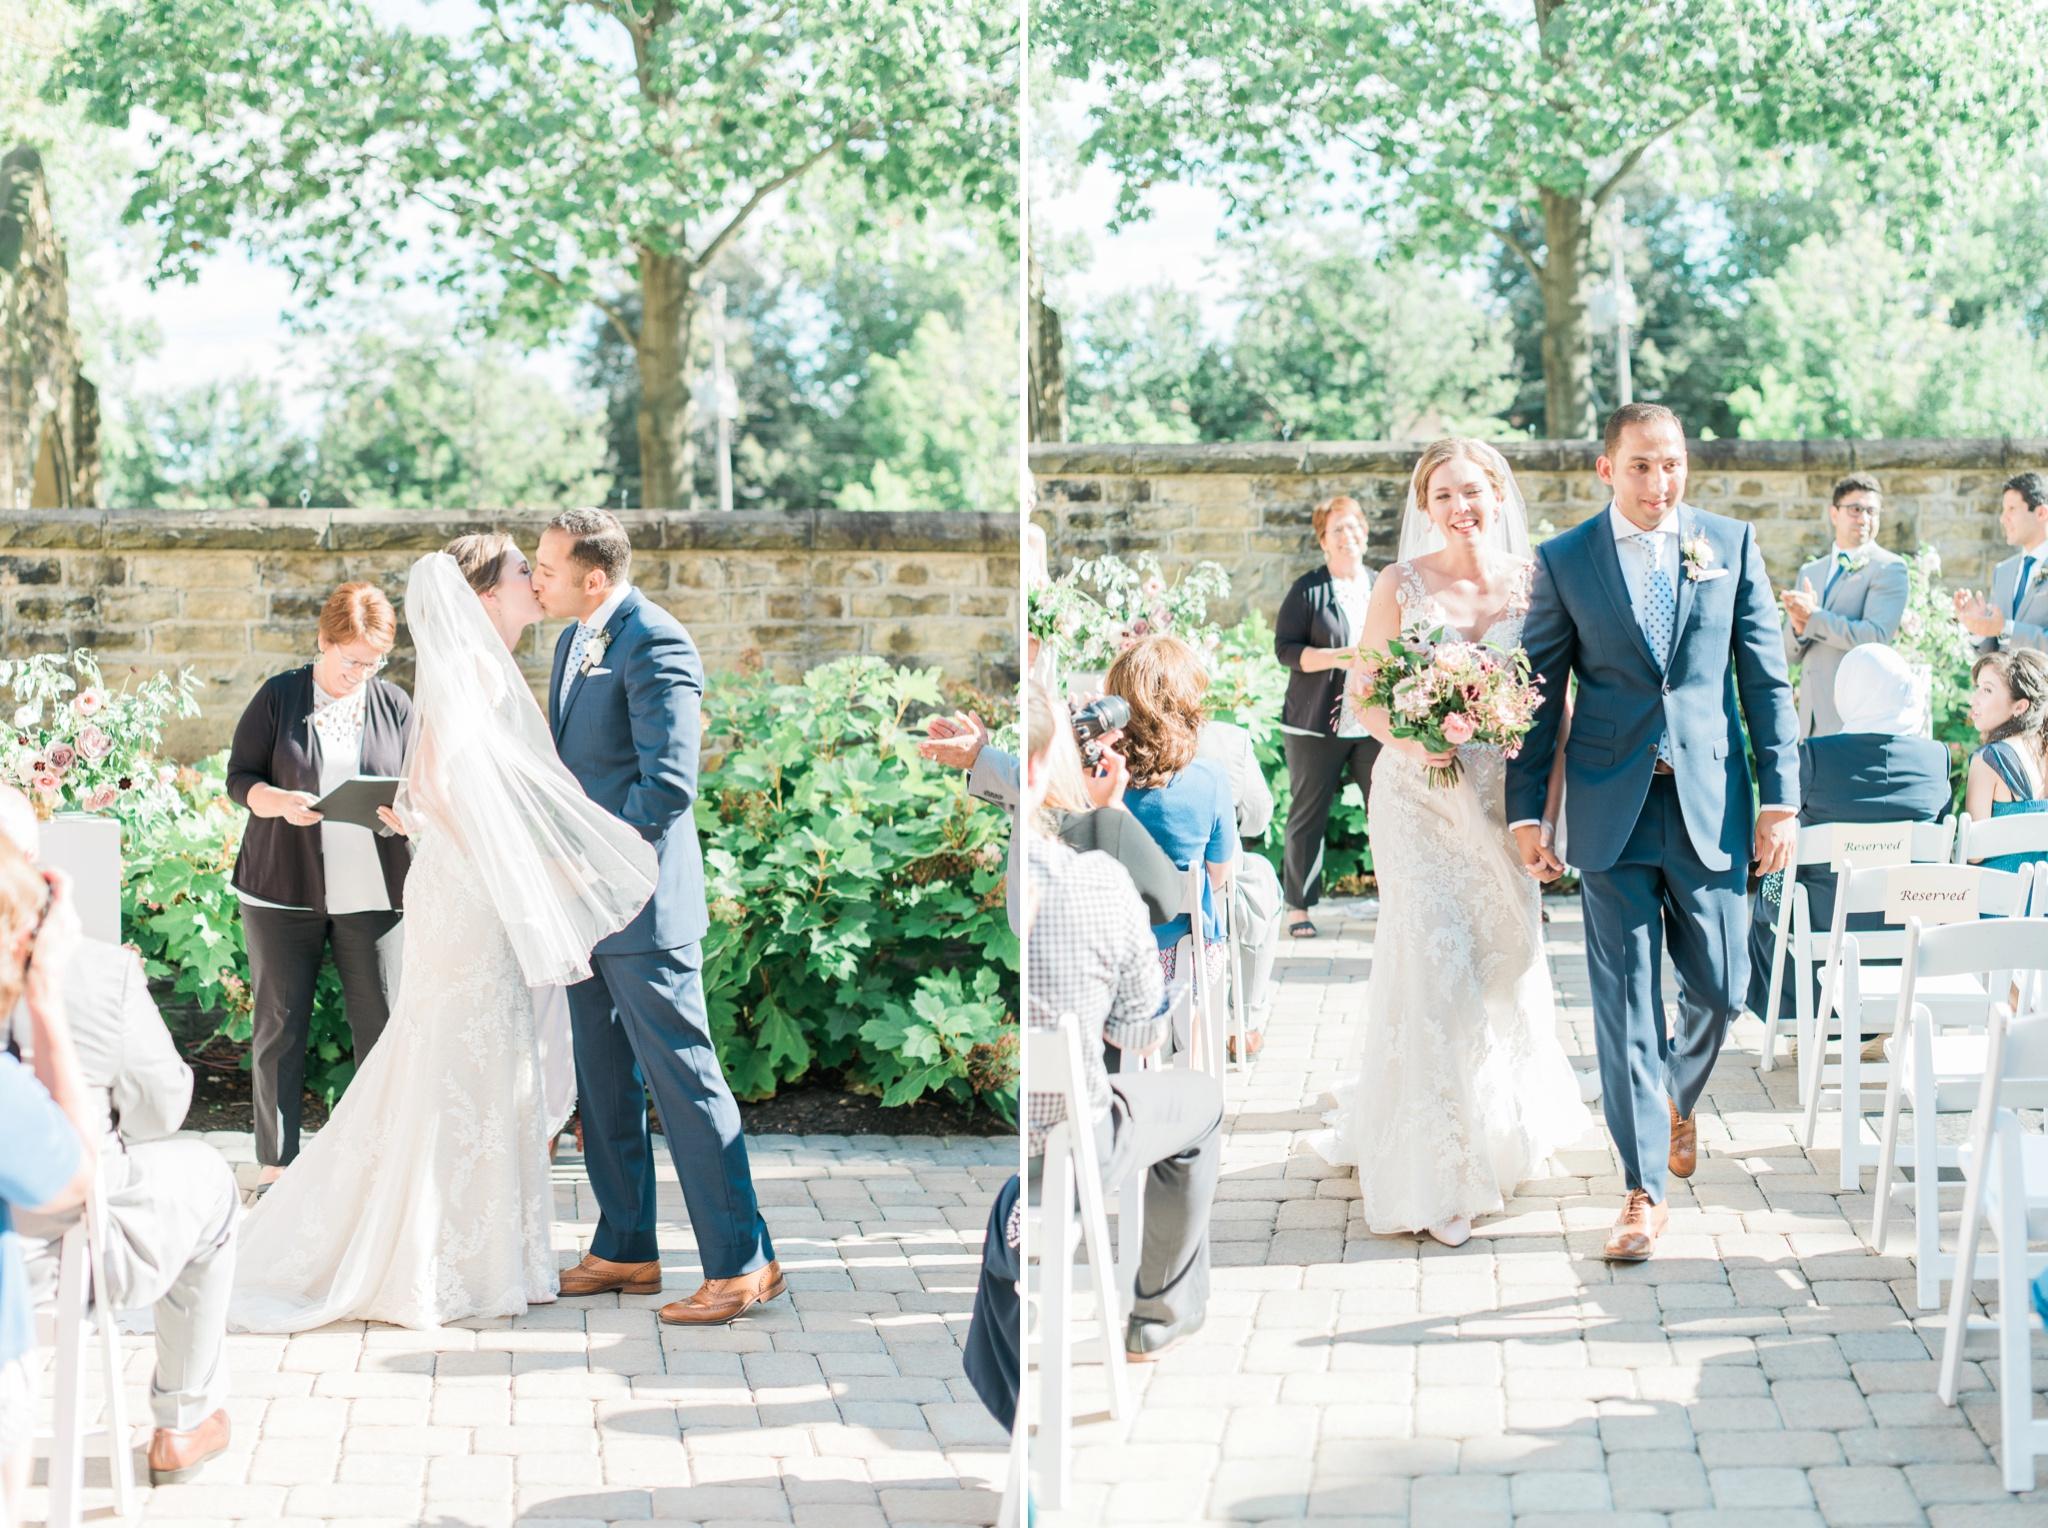 granville-inn-wedding-columbus-ohio-photographer_0042.jpg